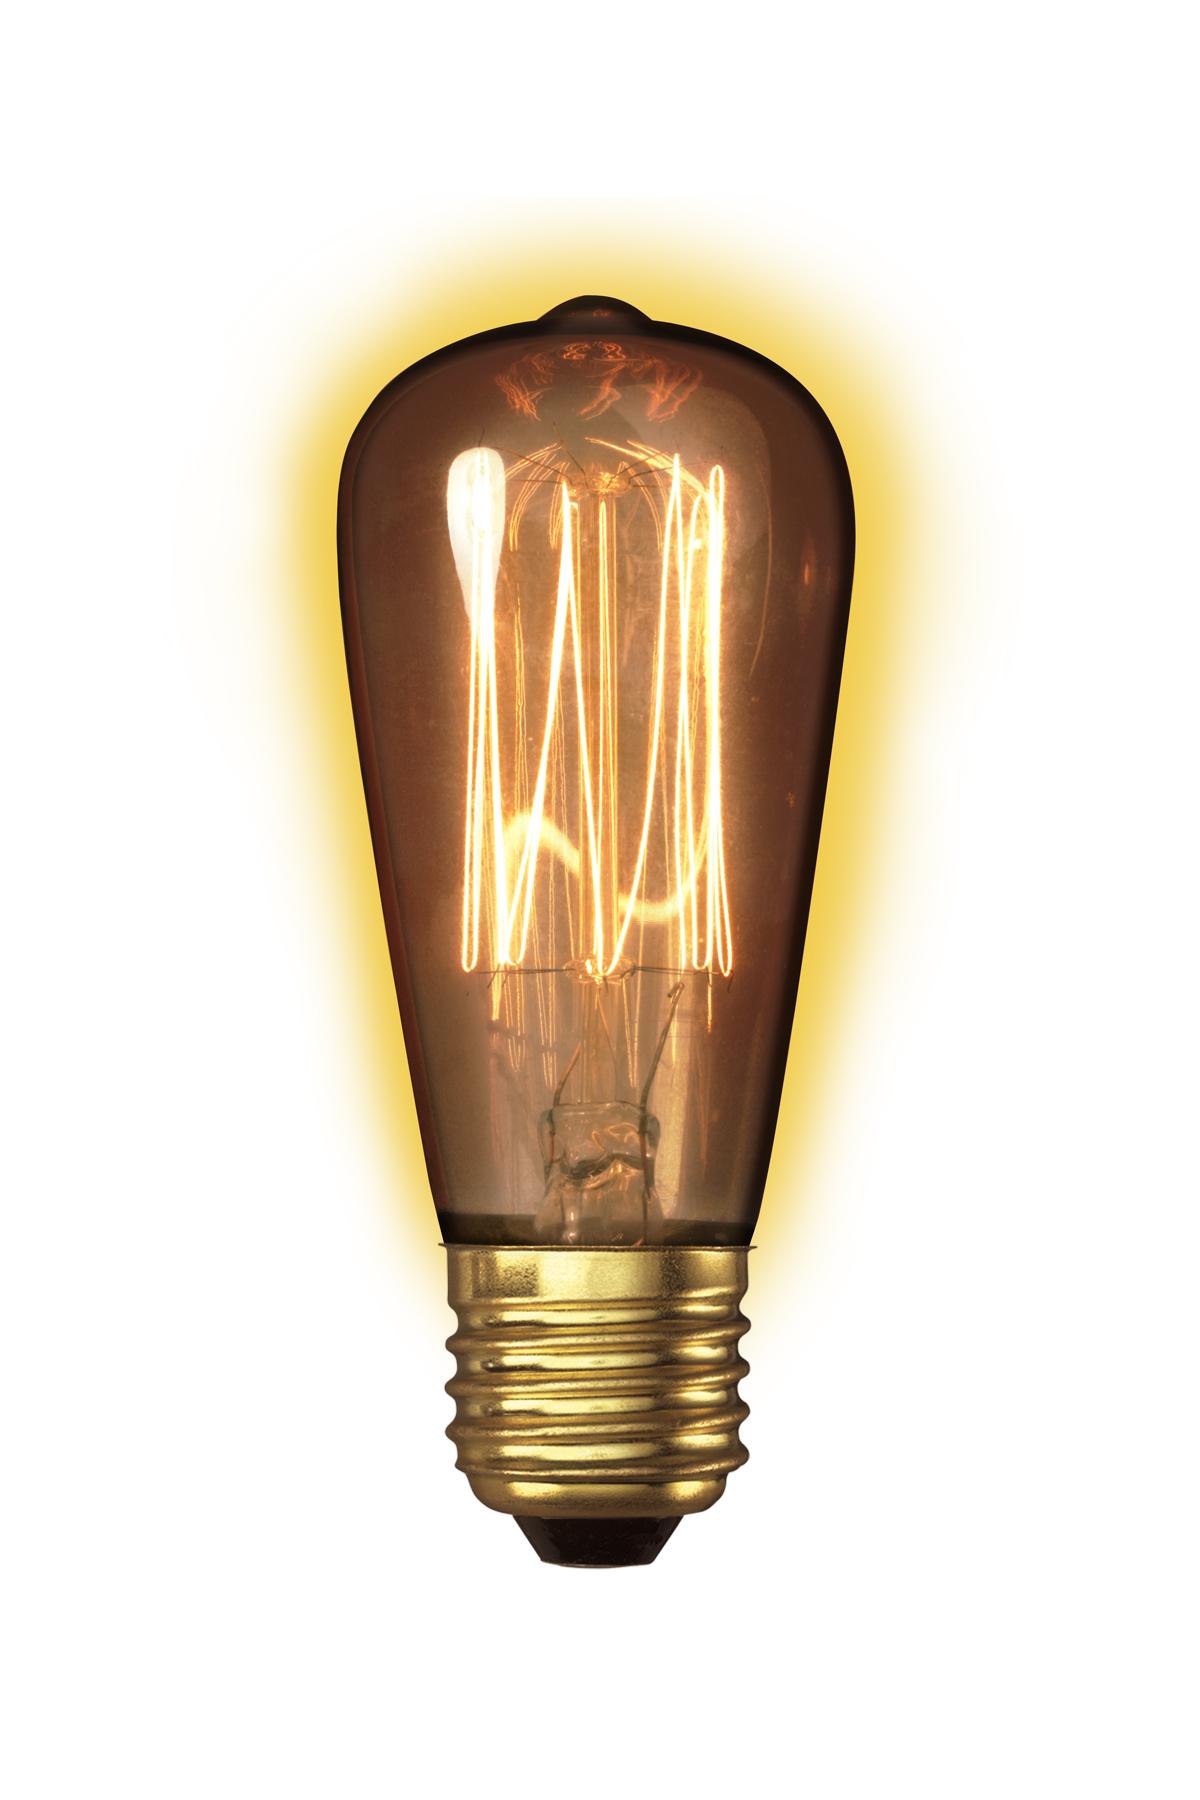 442508: Pearl LED Lamp Ball Filament ...